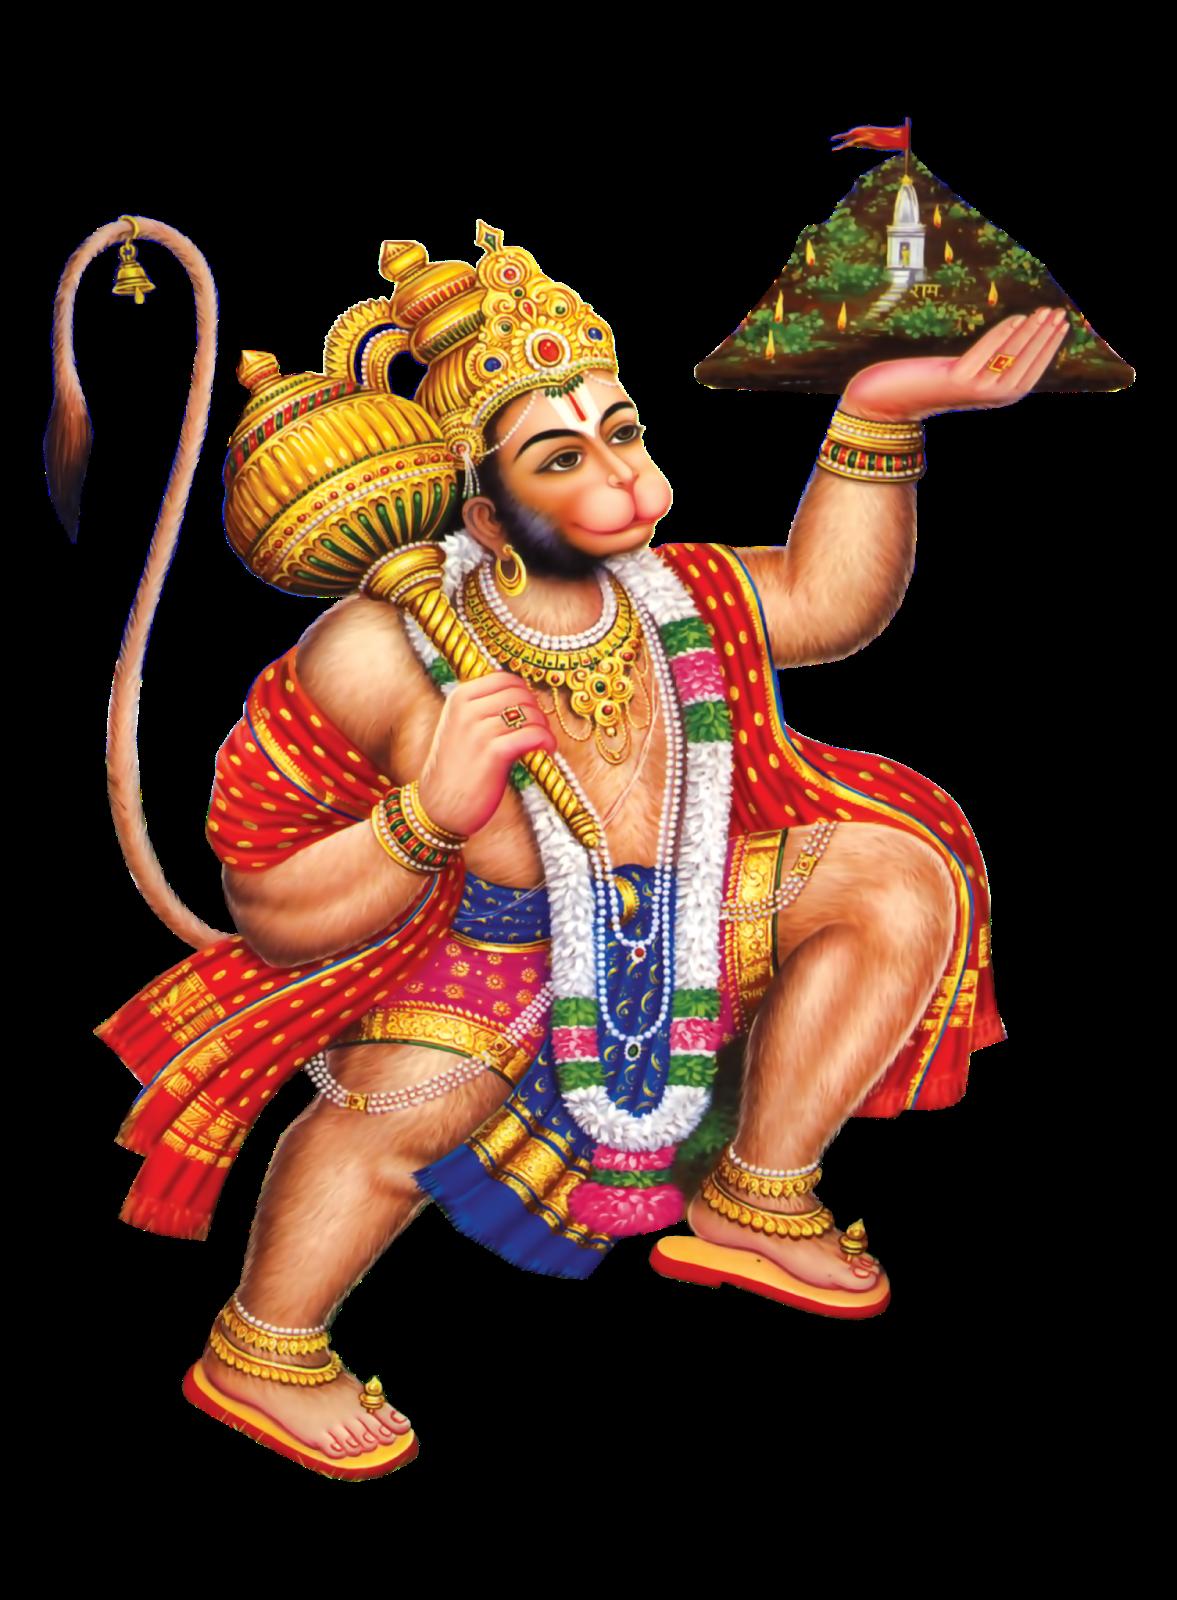 hanuman clipart free download - photo #17